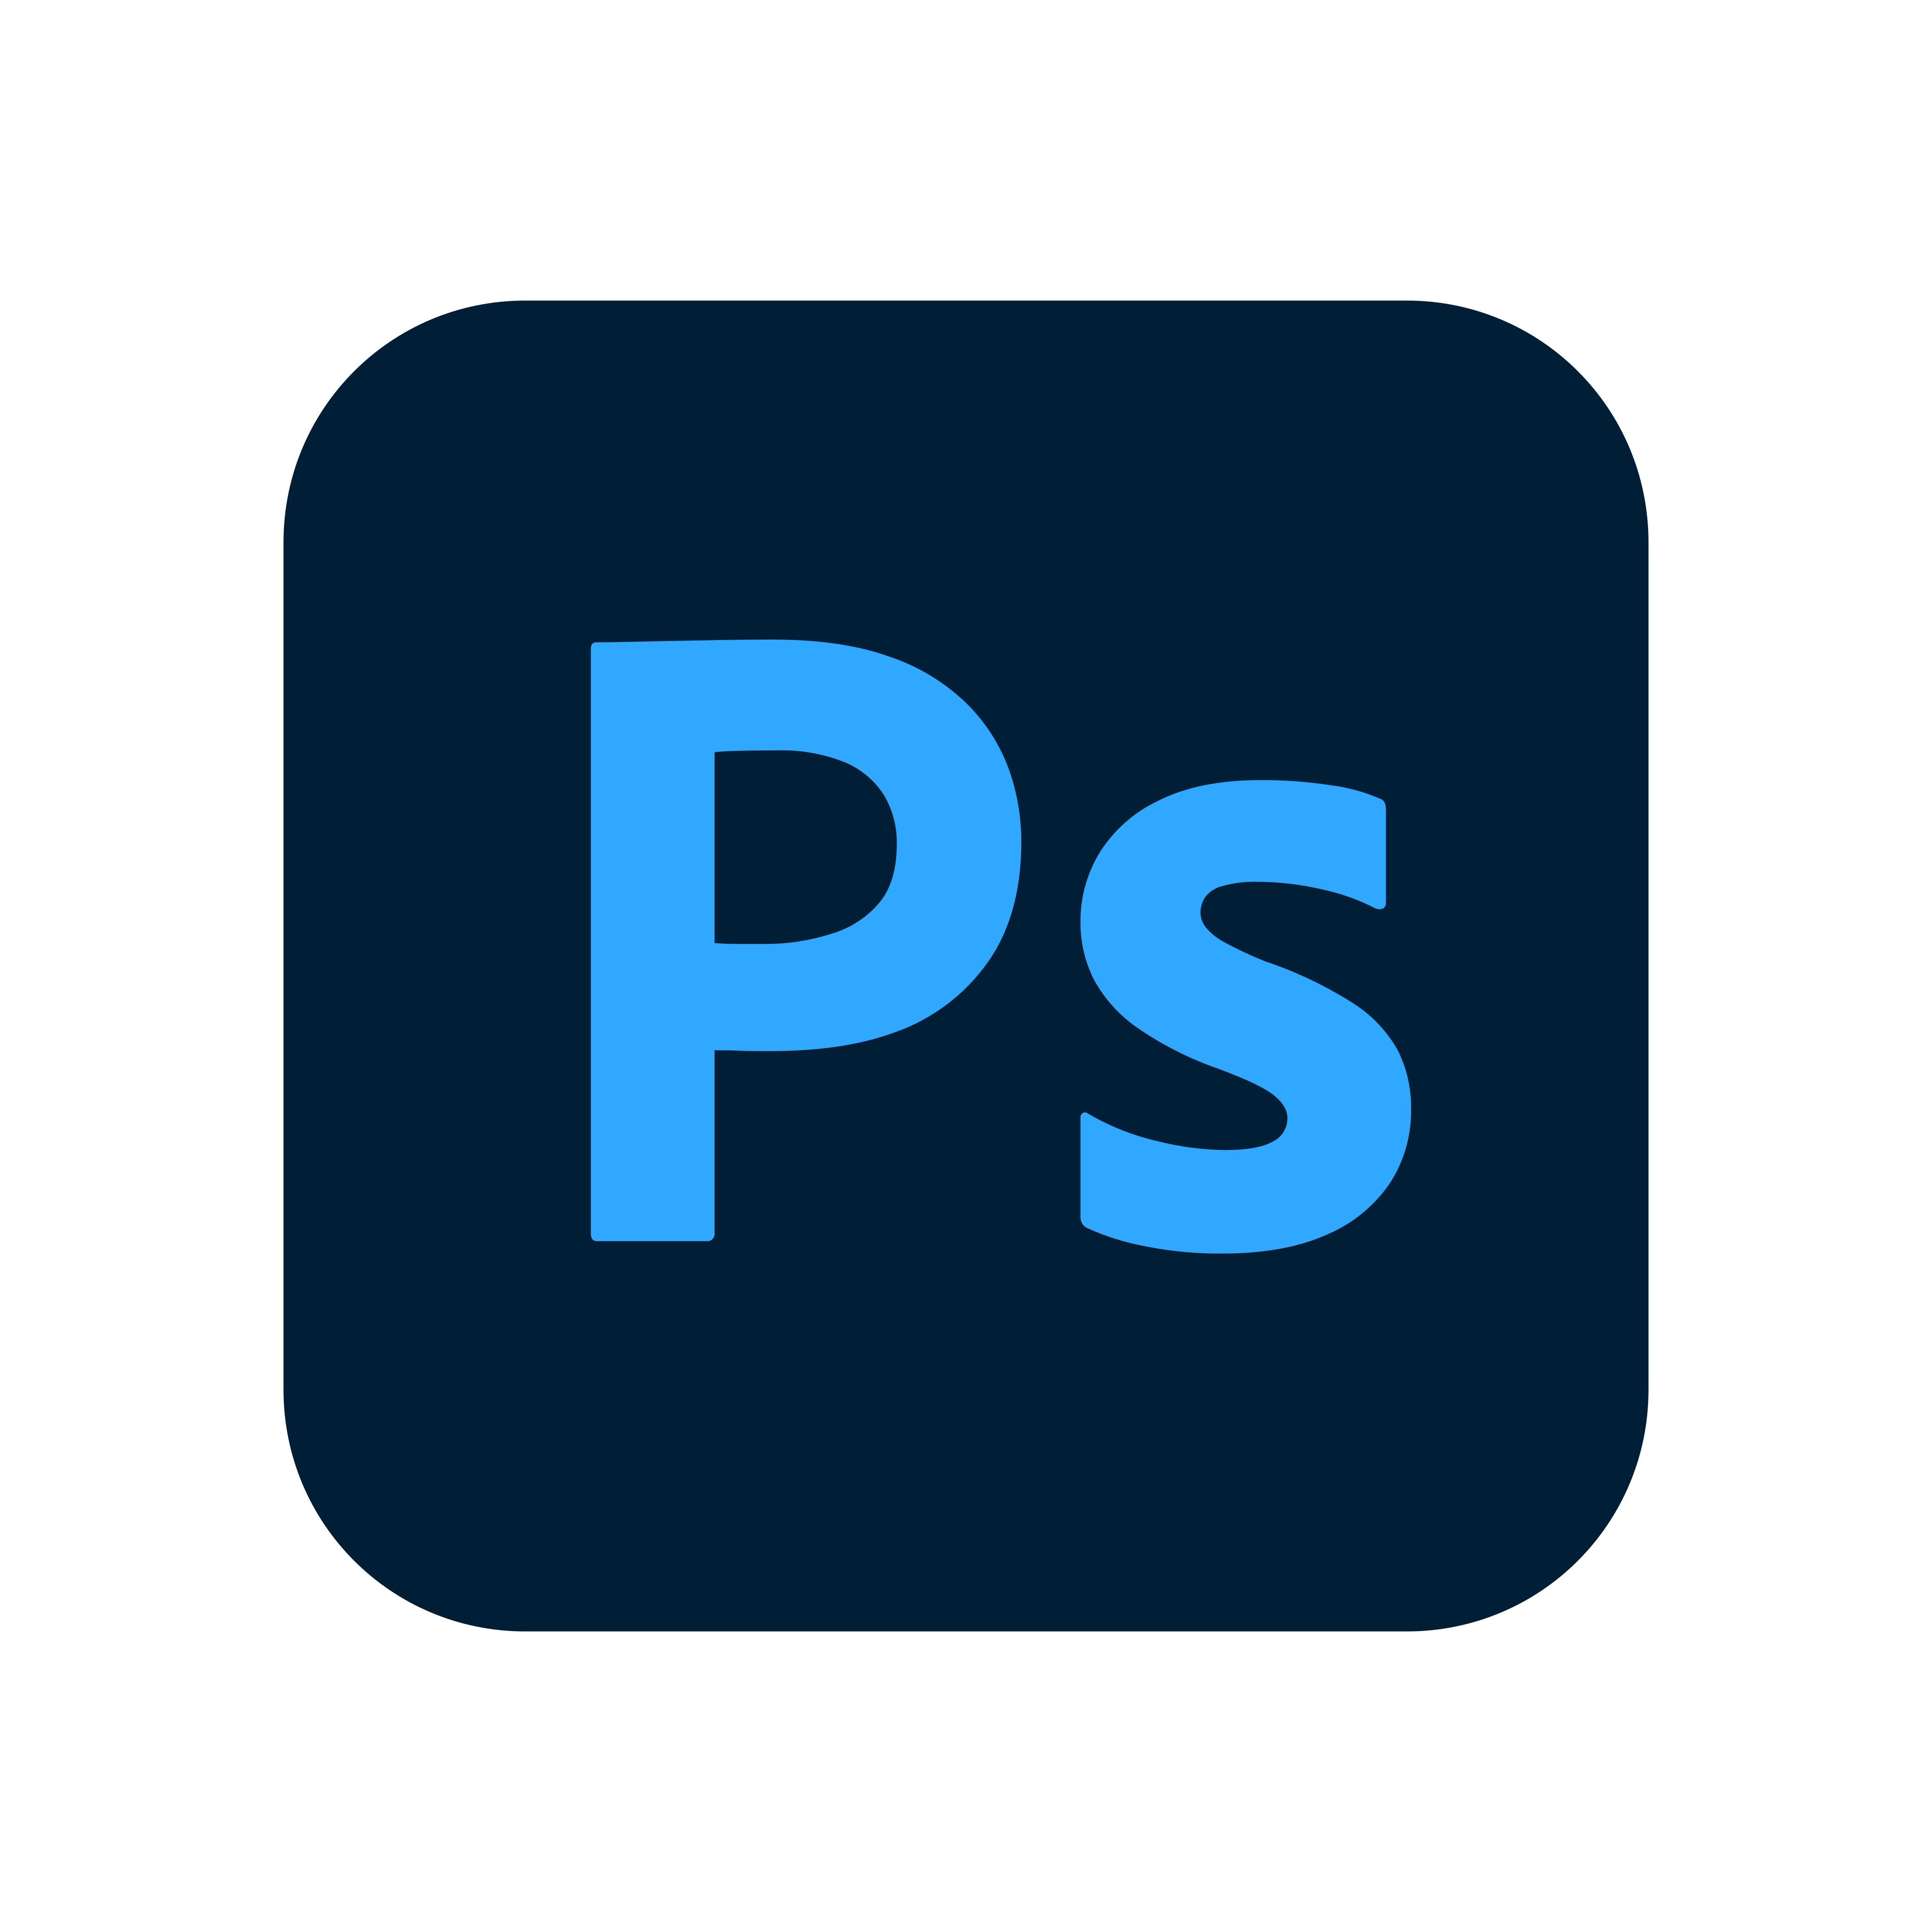 adobe photoshop logo 0 - Adobe Photoshop Logo